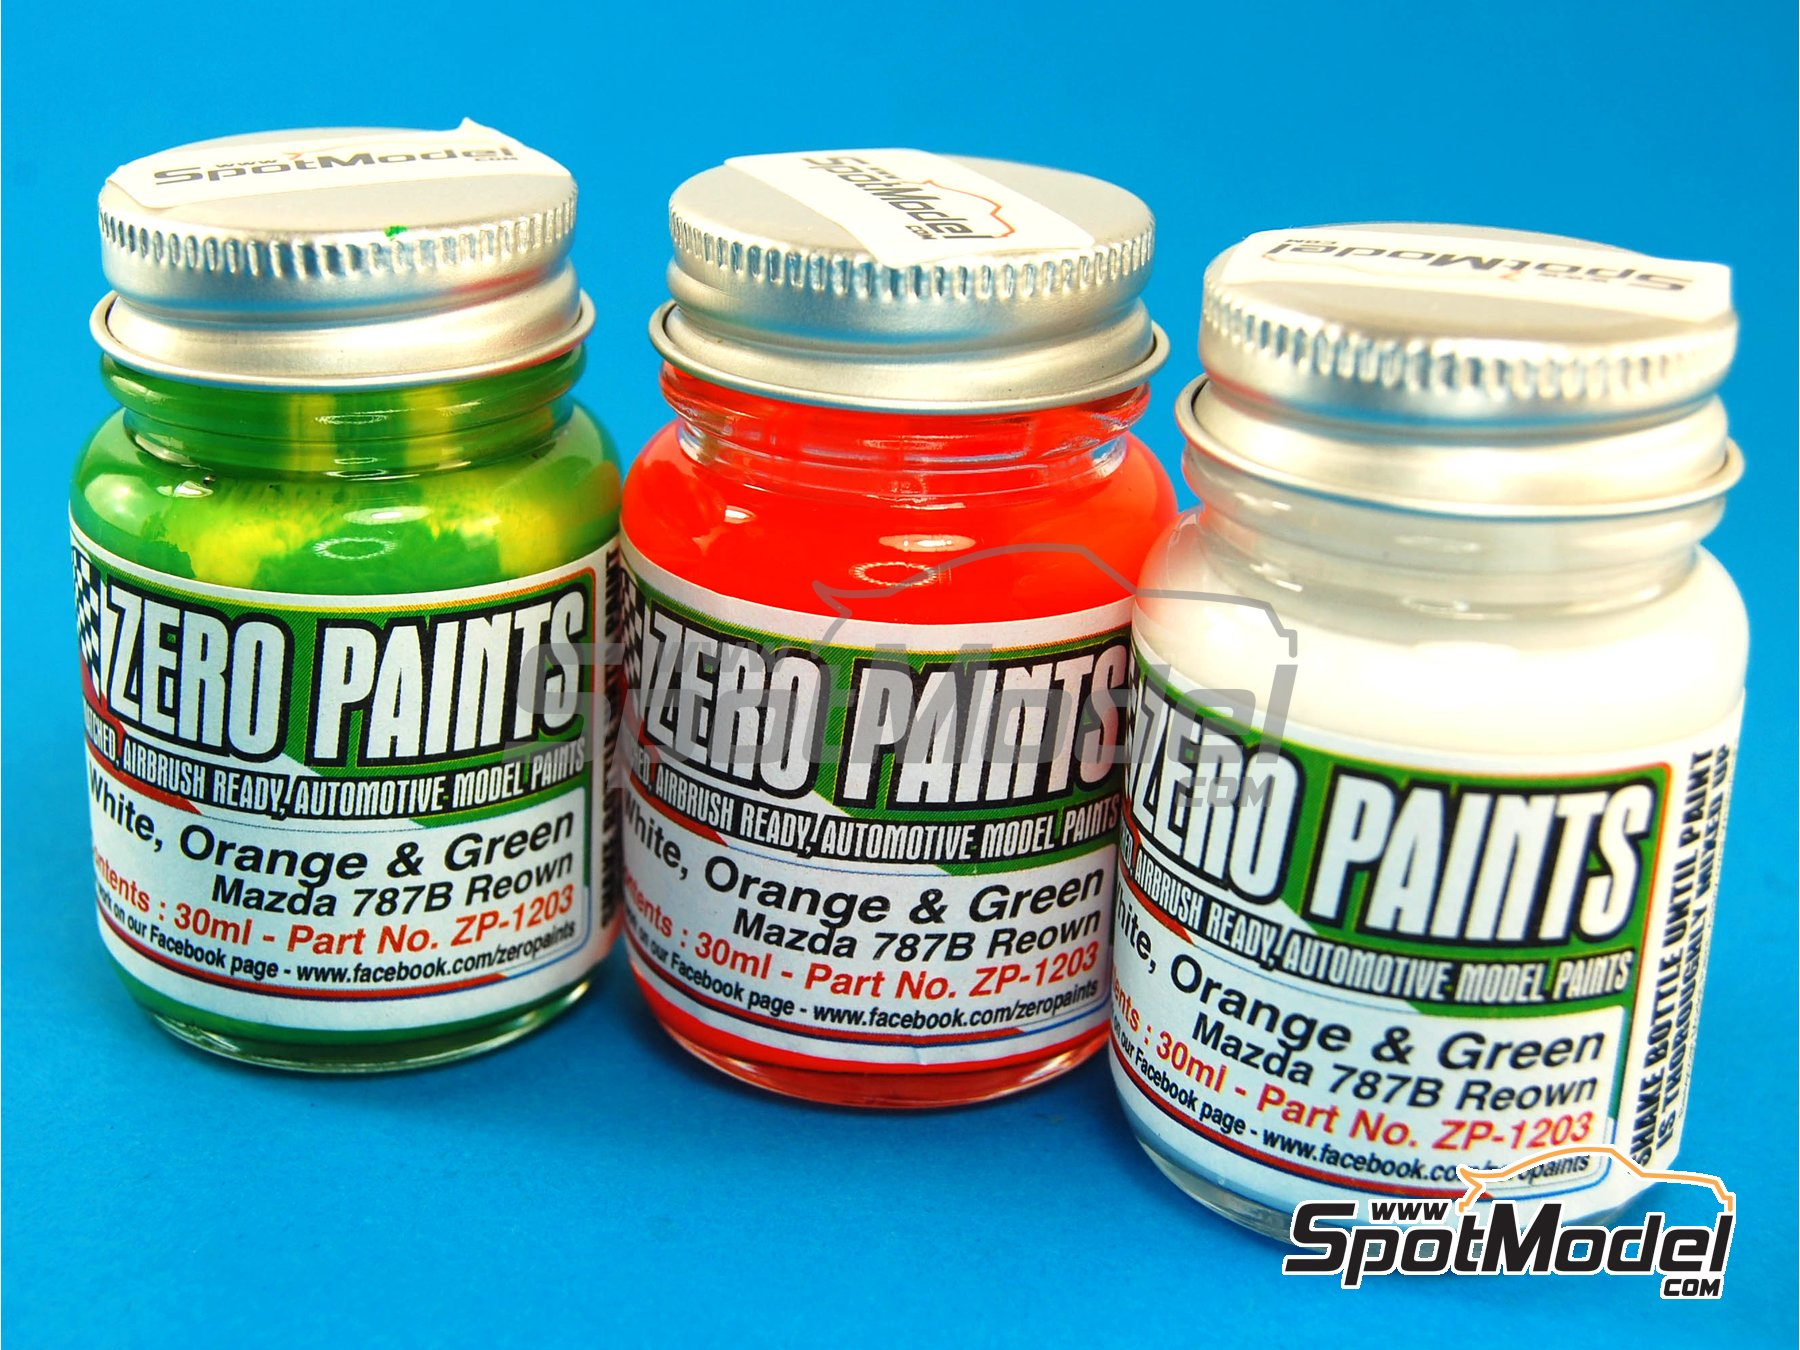 Image 1: Mazda 787B Renown - White +  Orange + Green - 3 x 30ml   Paints set manufactured by Zero Paints (ref.ZP-1203)